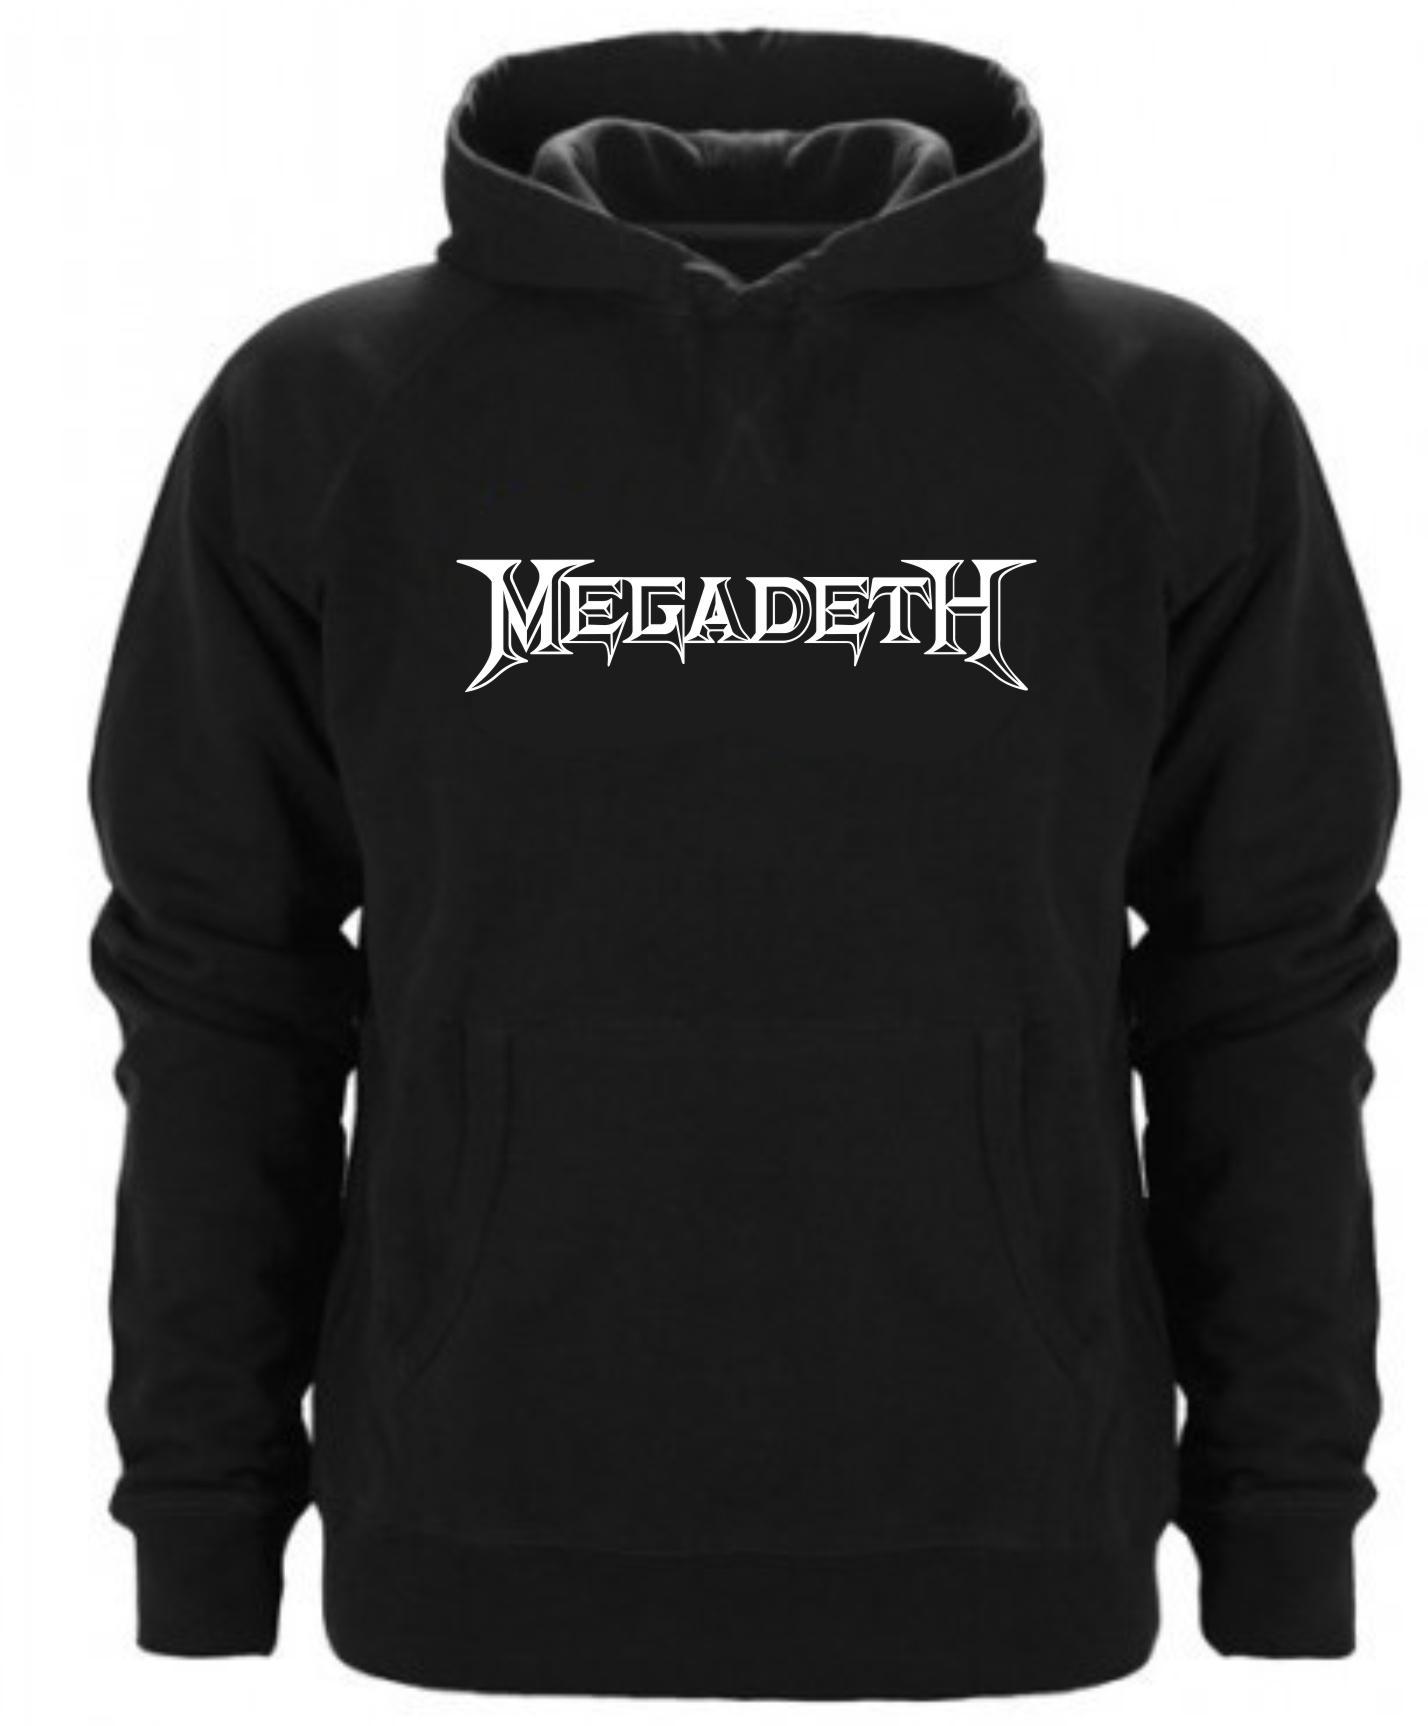 SUDADERA CAPUCHA MEGADETH